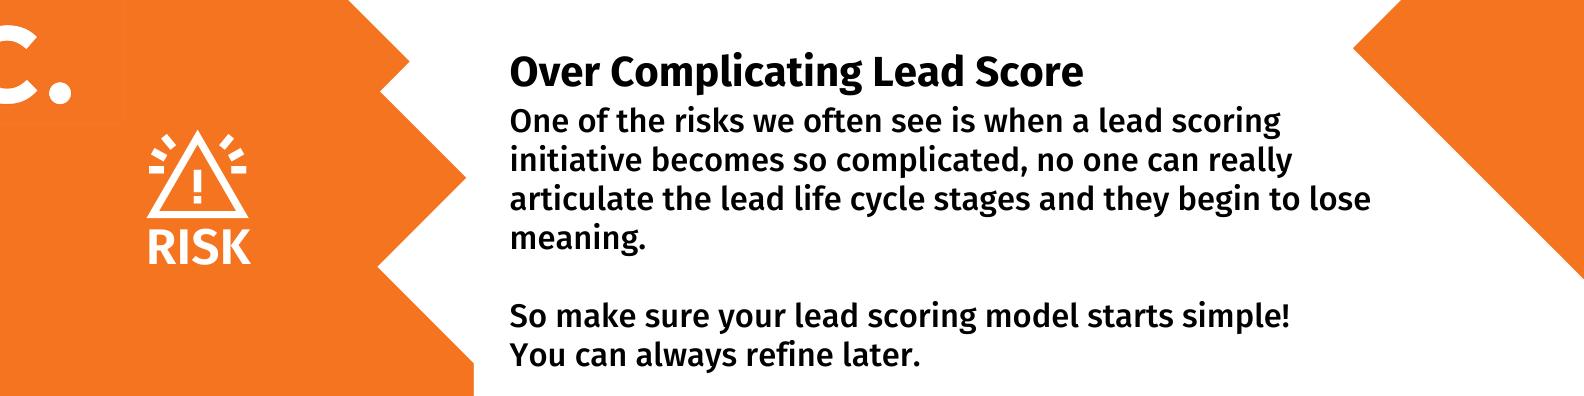 Risk! 1 Lead Scoring Problems